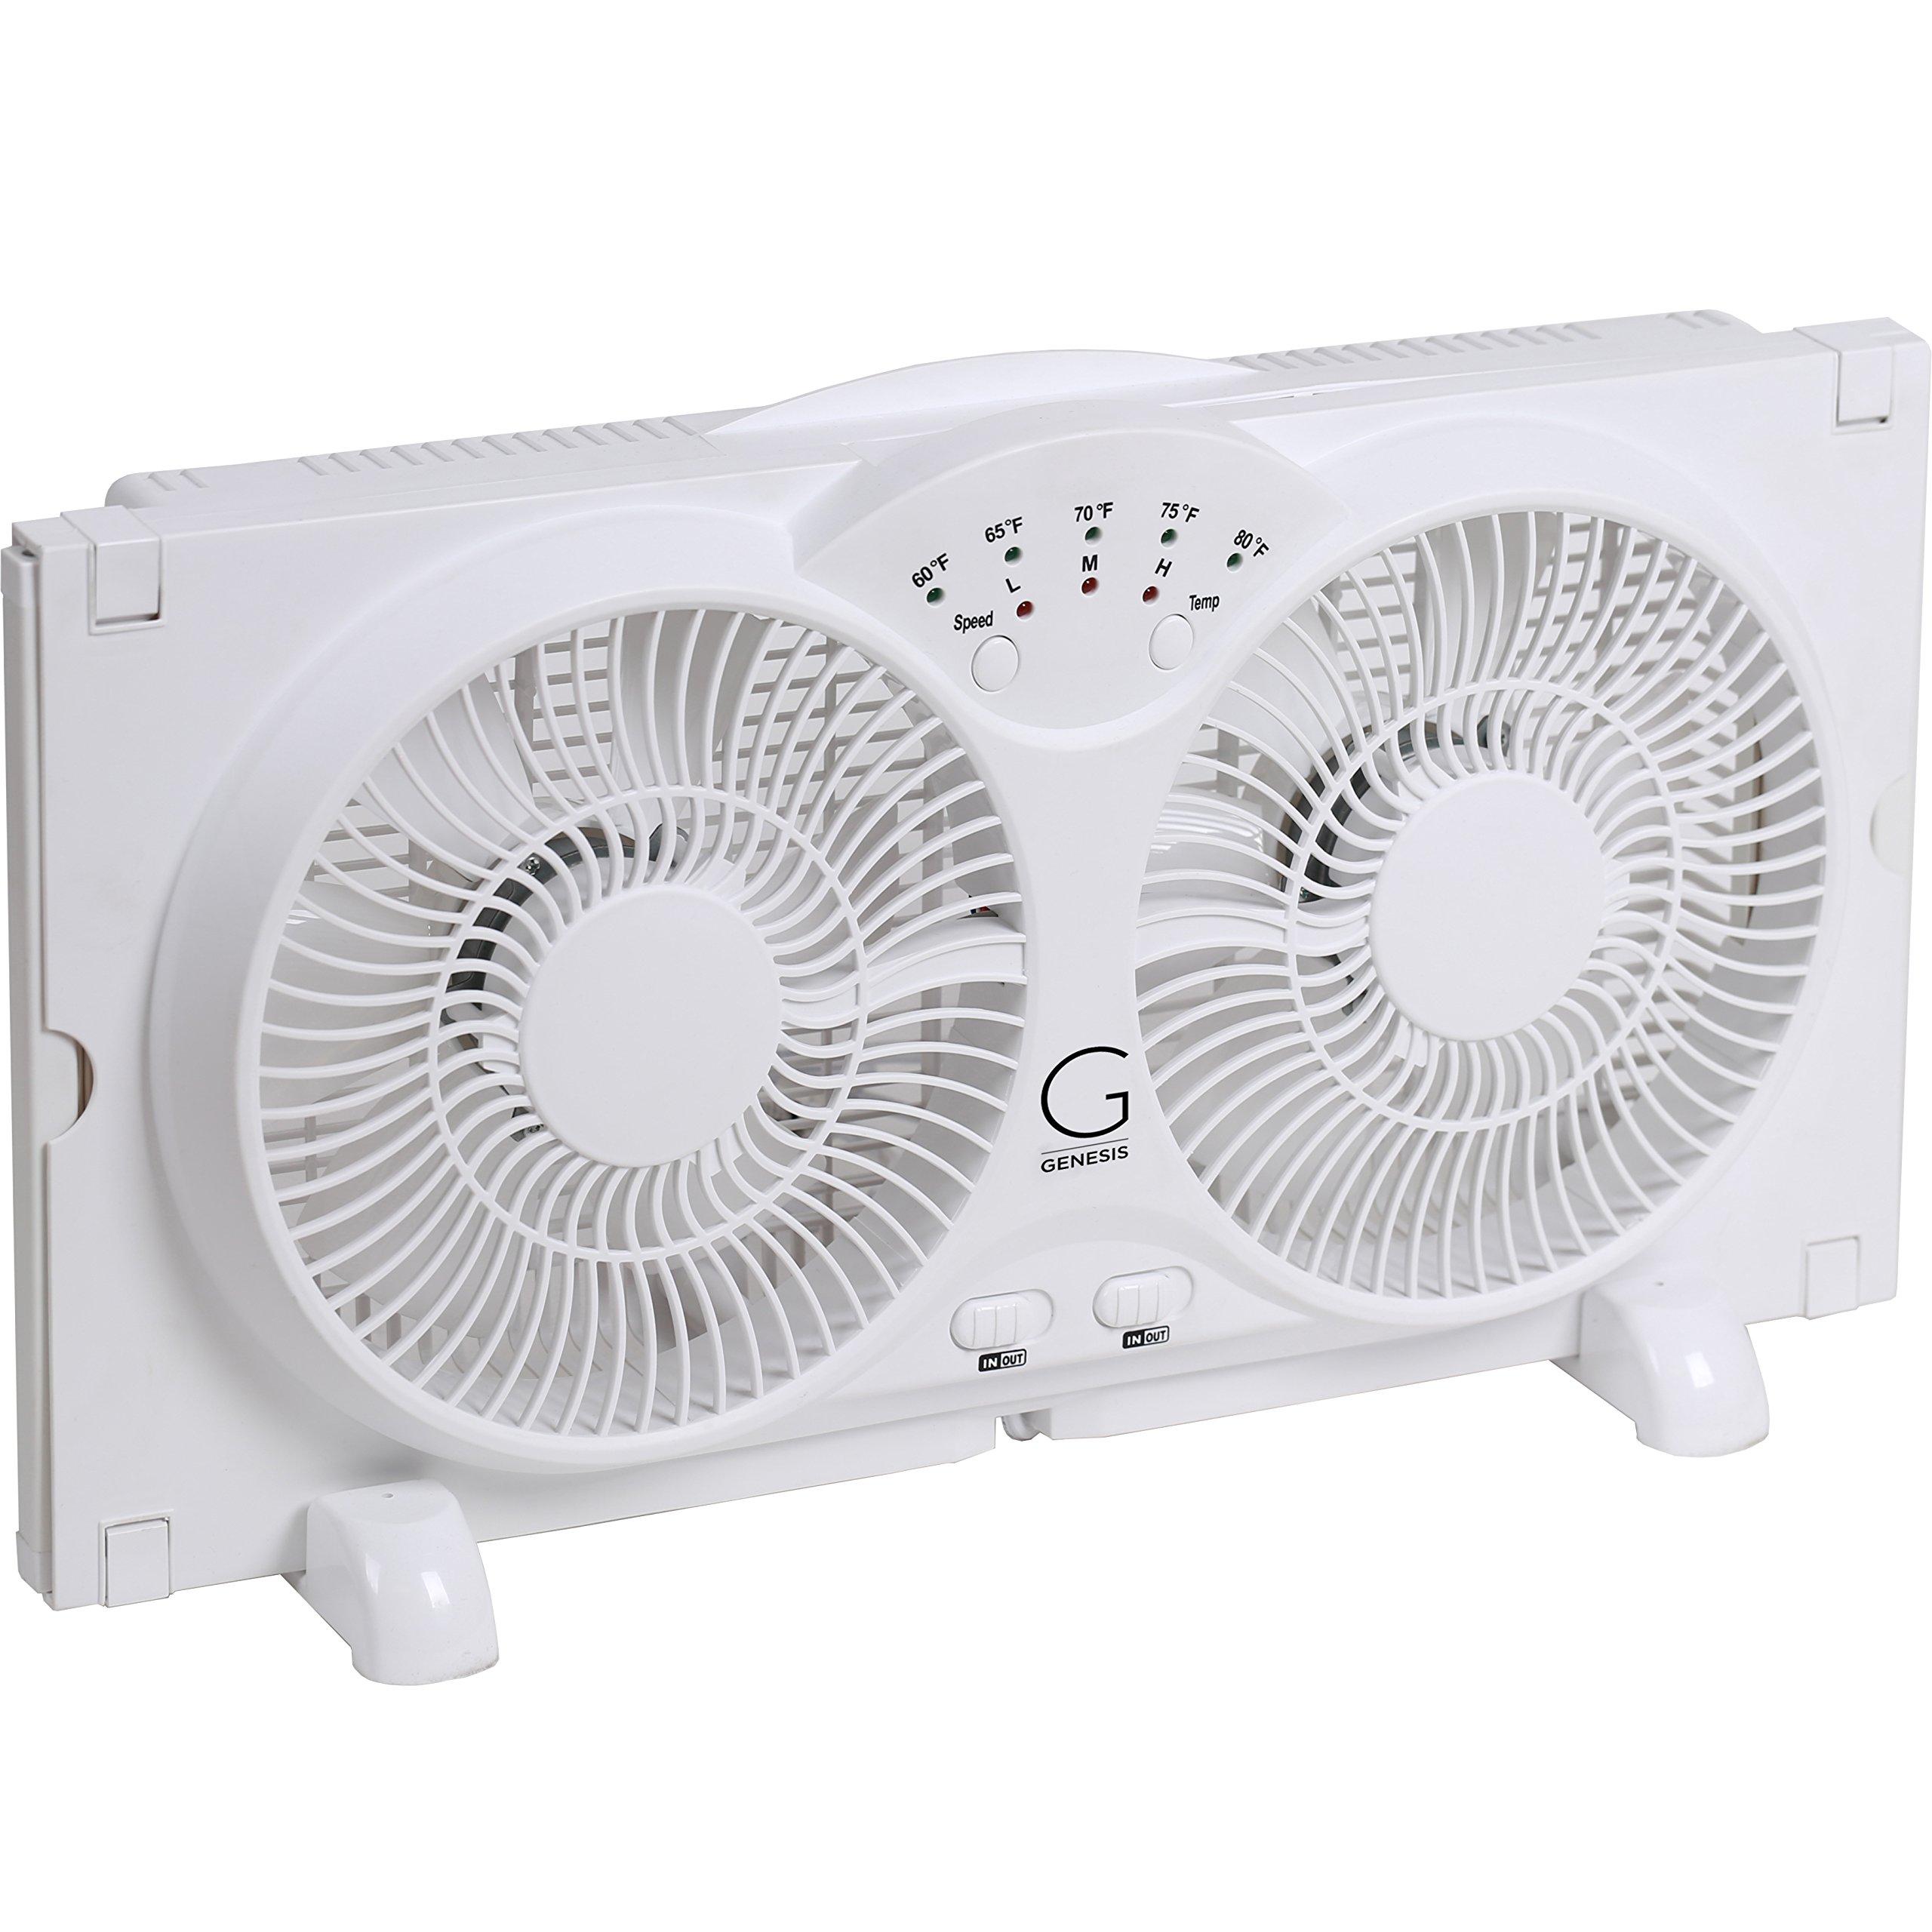 Reversible Indicator Adjustable Thermostat Technology